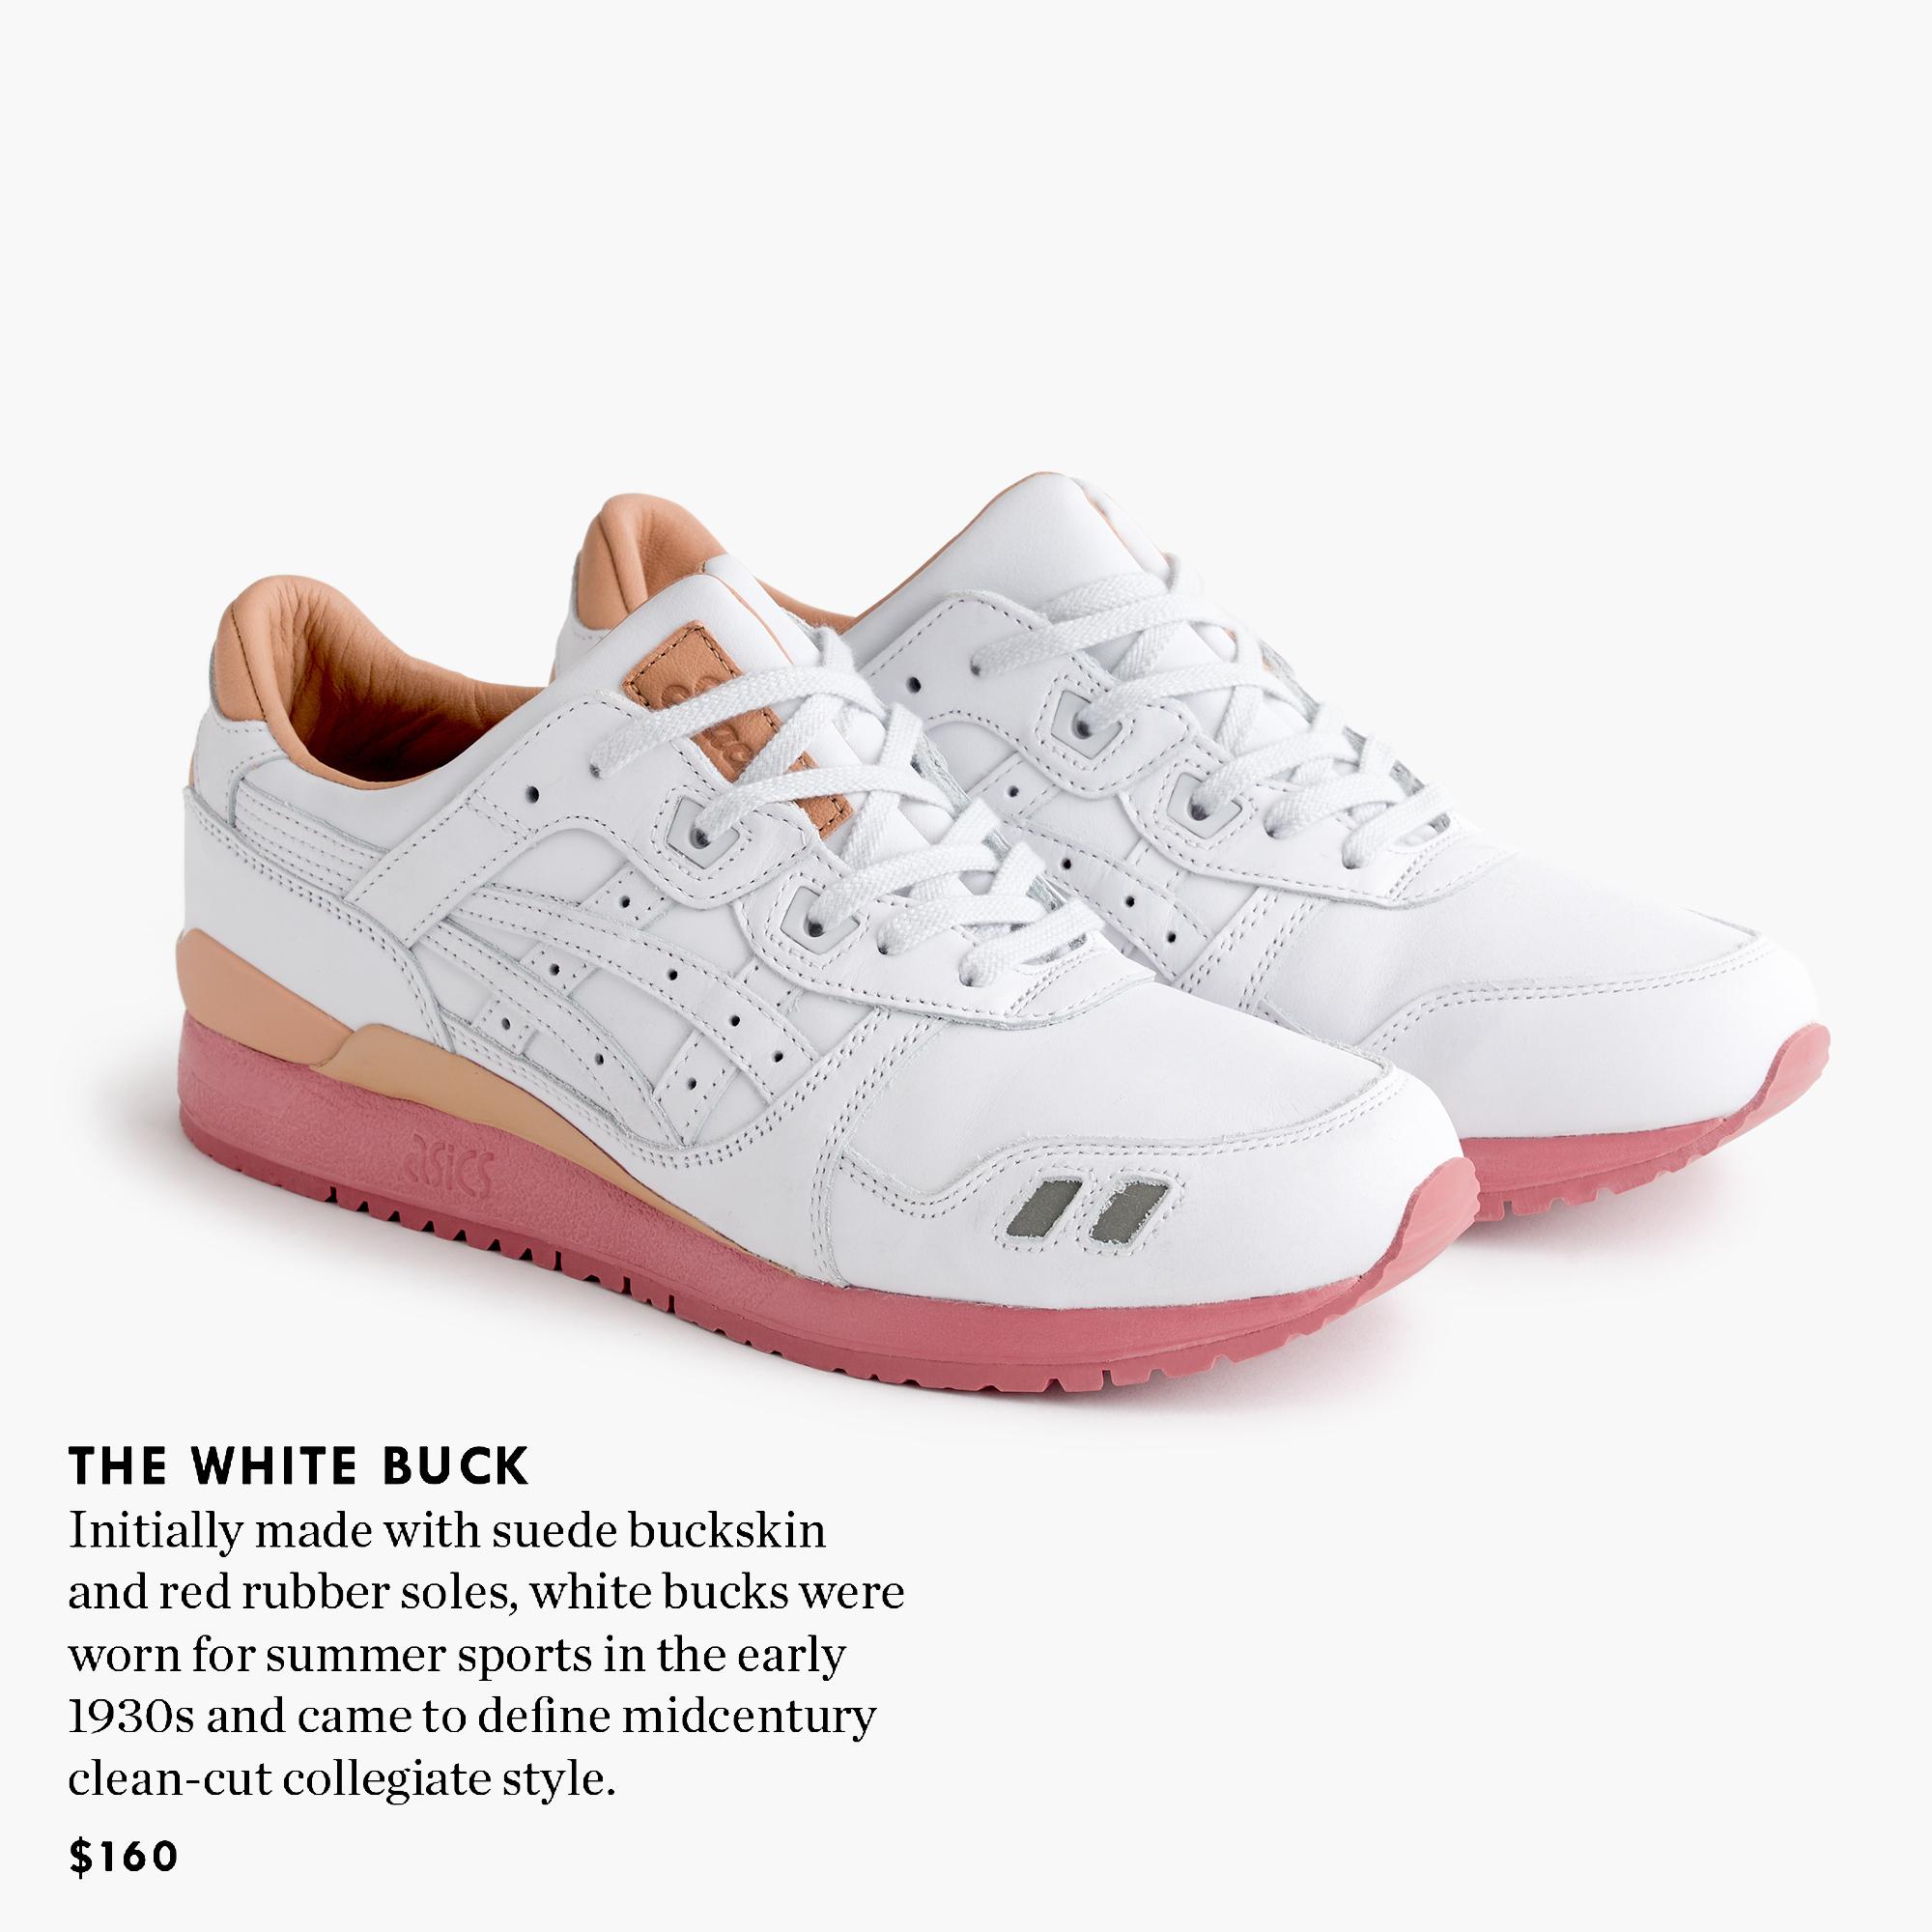 chaussures buck packer white jcrew asics tigre 1907 1907 collection white buck 1 b79611c - sbsgrp.website